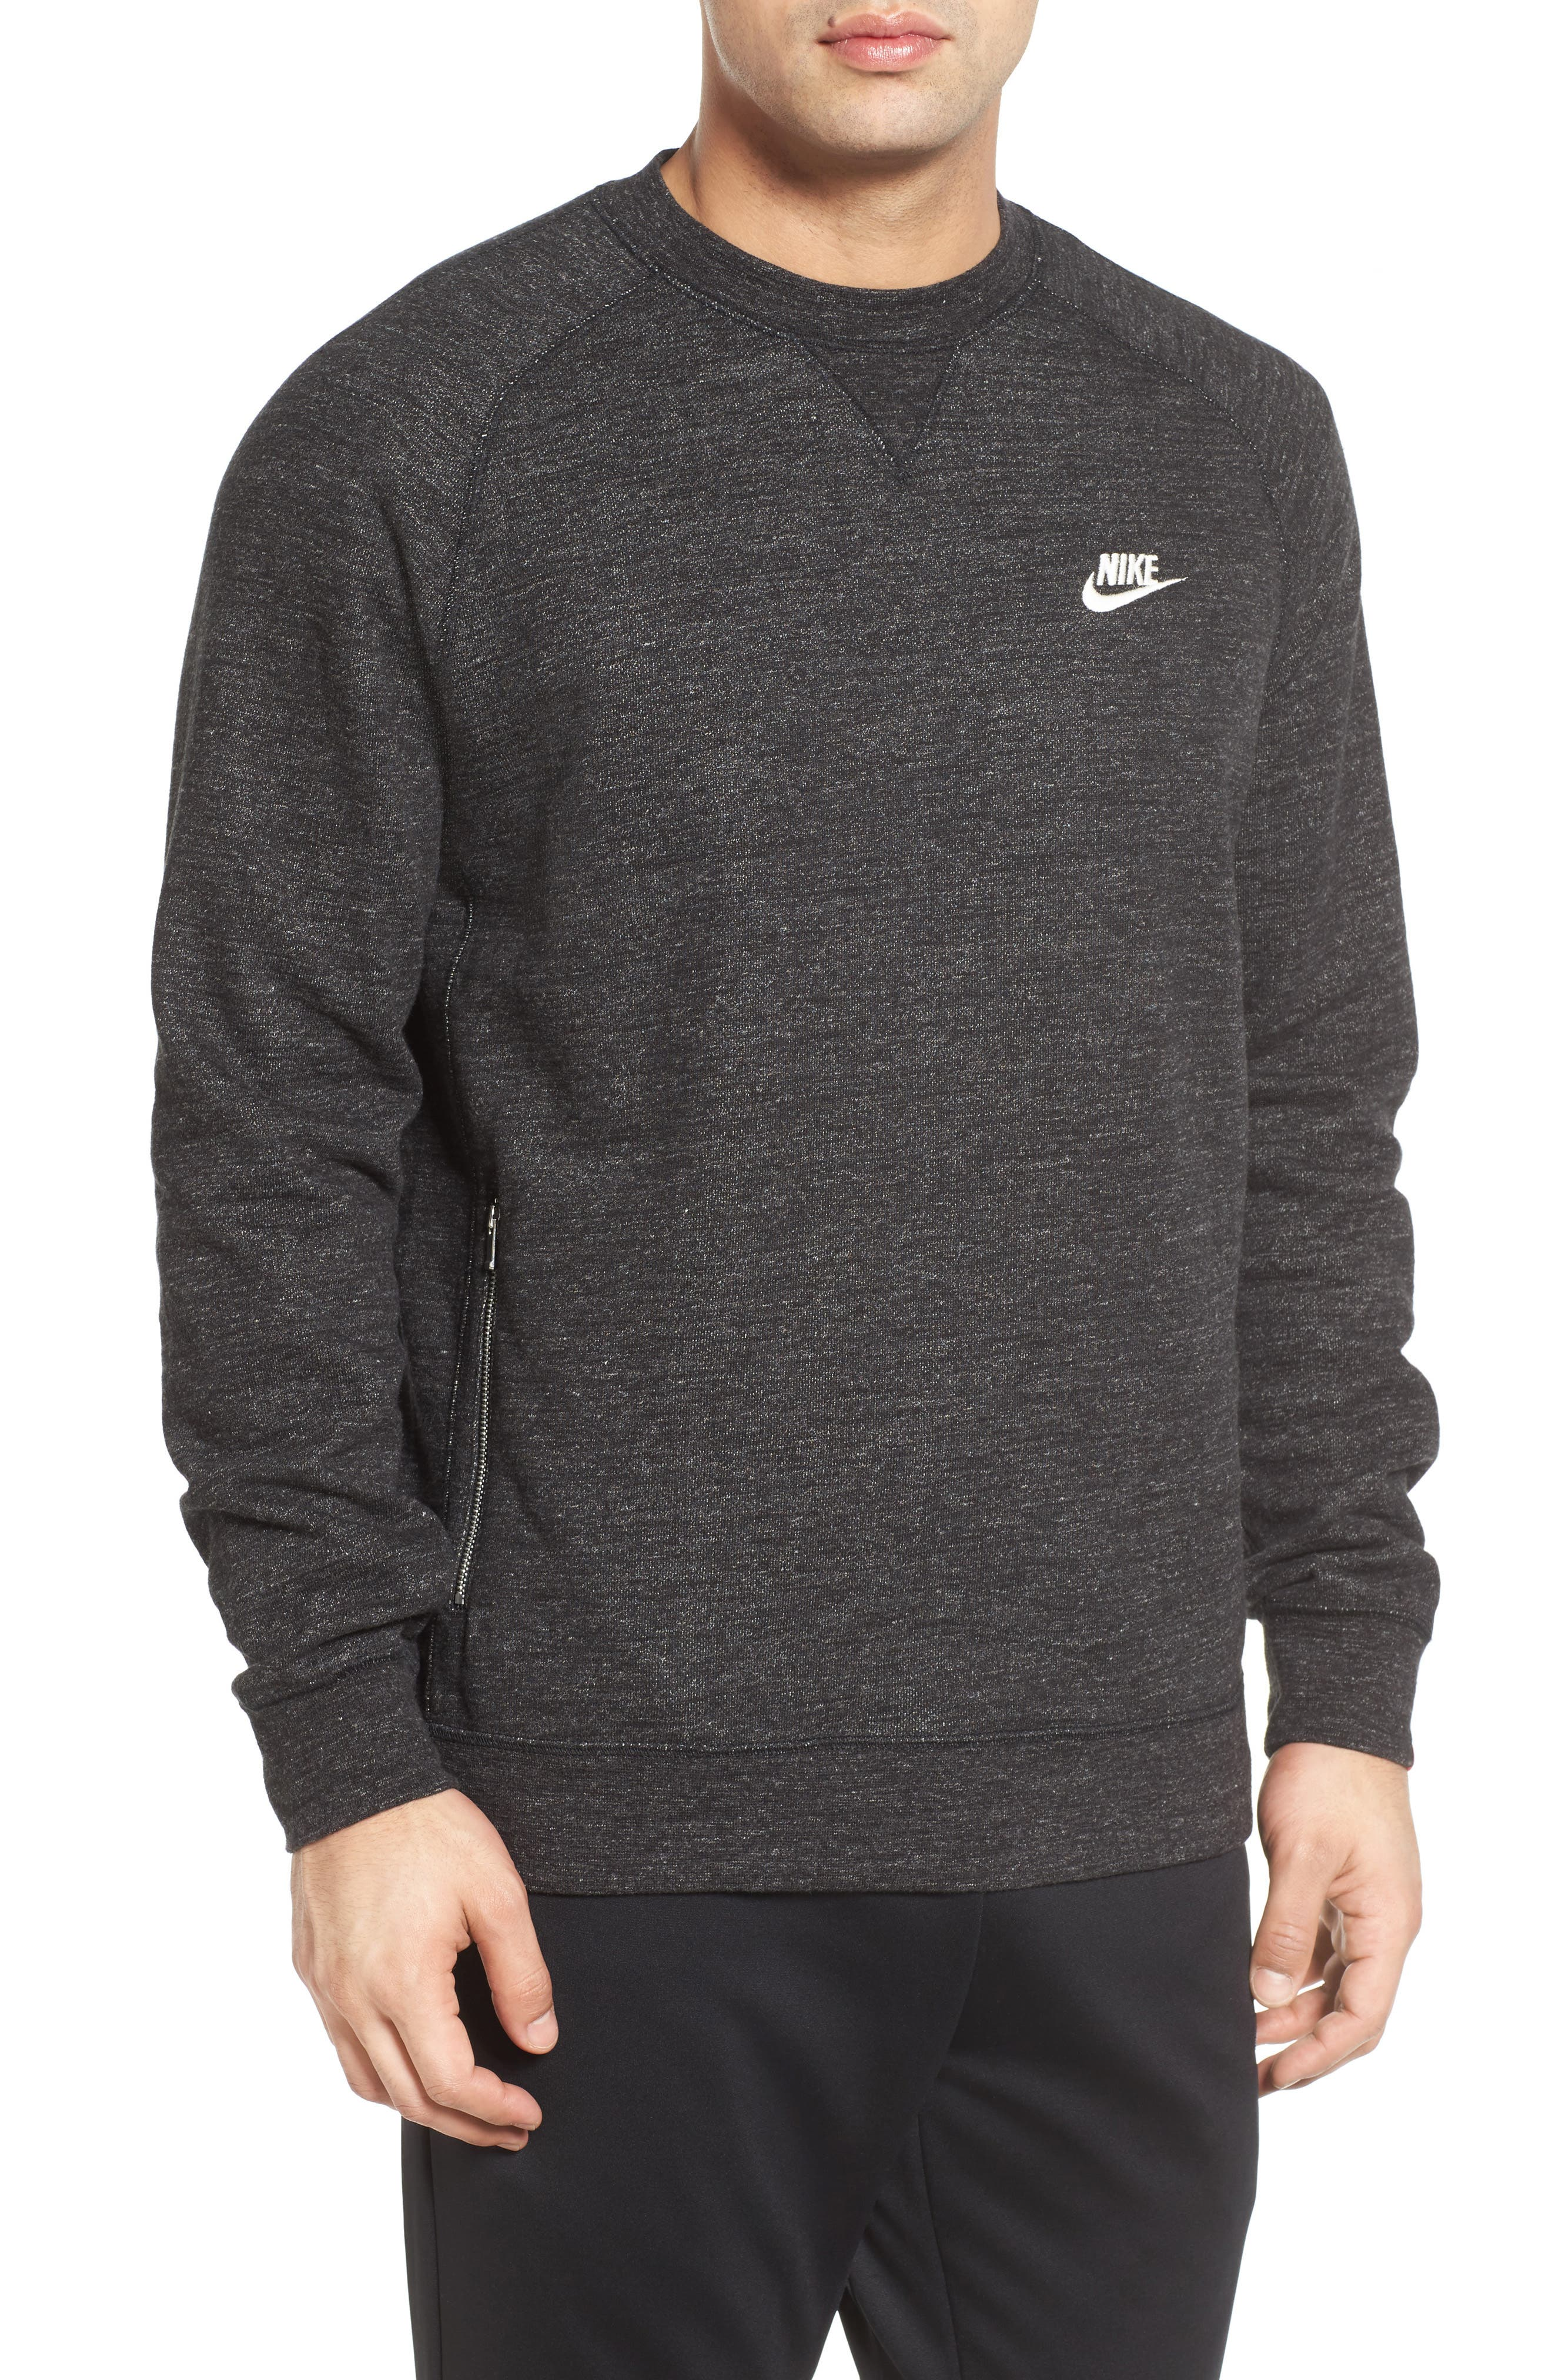 Legacy Raglan Crewneck Sweatshirt,                         Main,                         color, Black Heather/ Sail